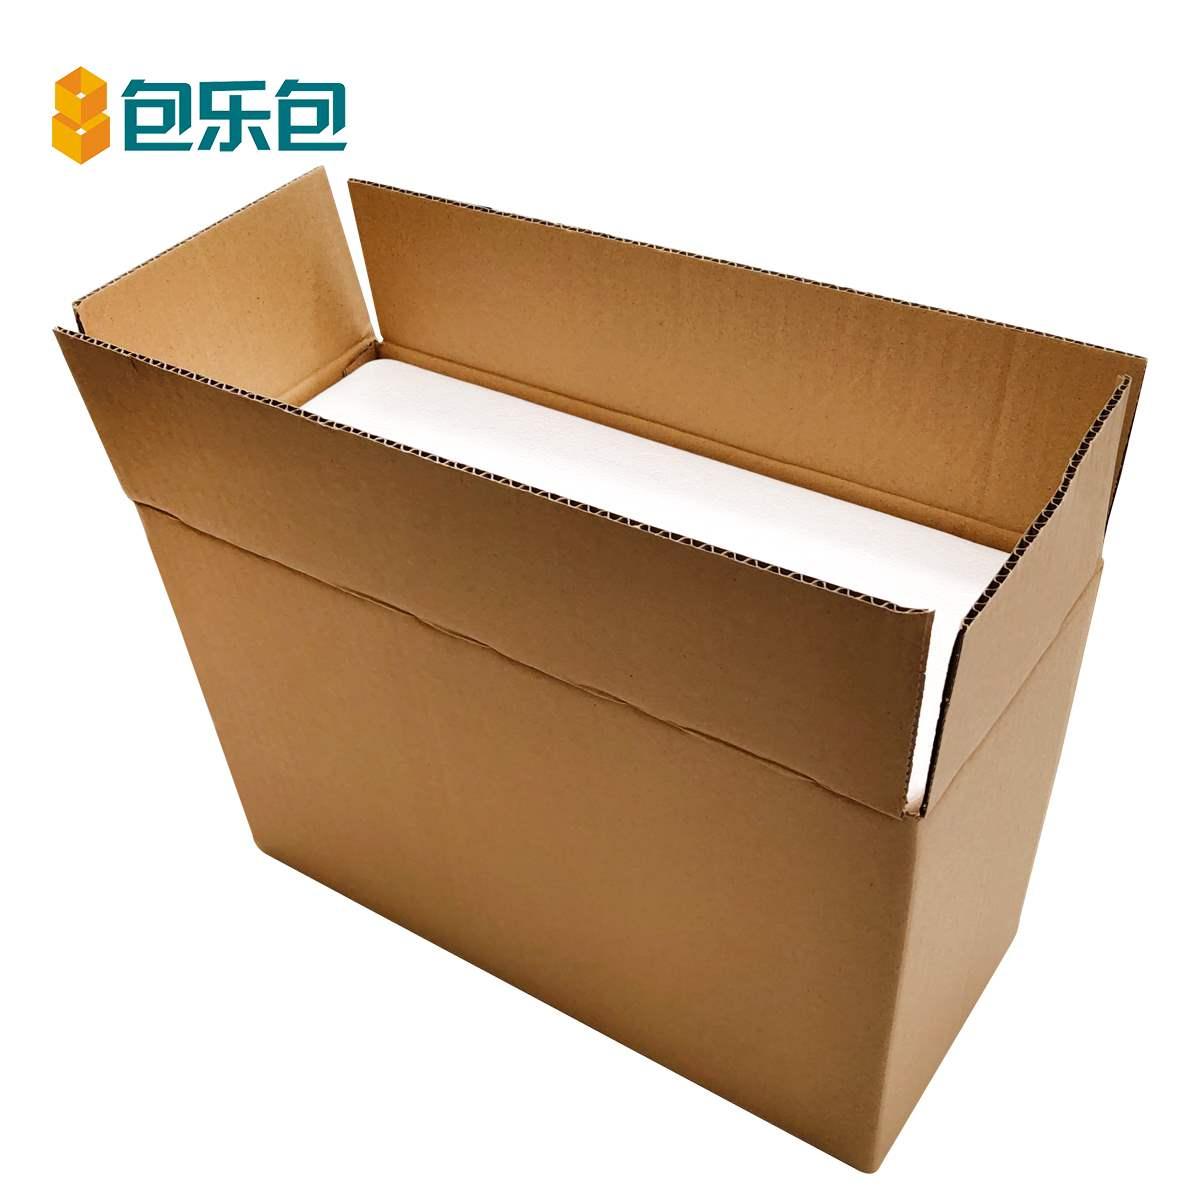 Картонные коробки / Упаковка из пенопласта Артикул 615800281412